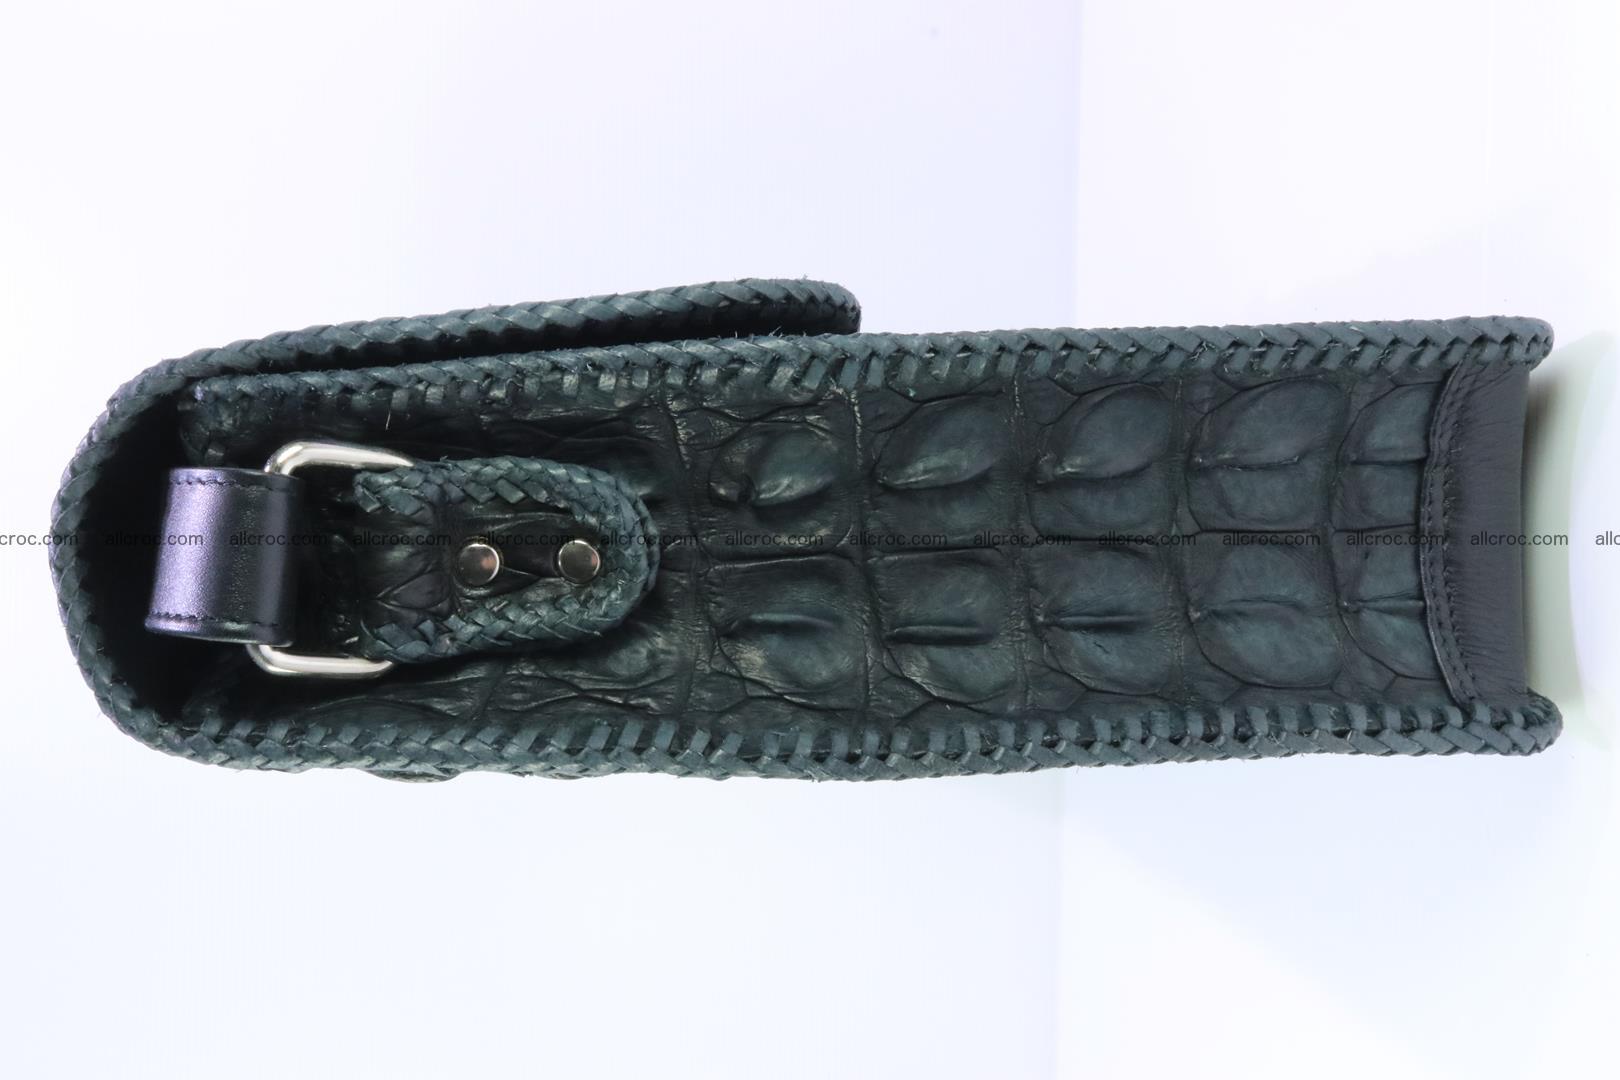 Crocodile skin shoulder bag with braided edges 146 Foto 4